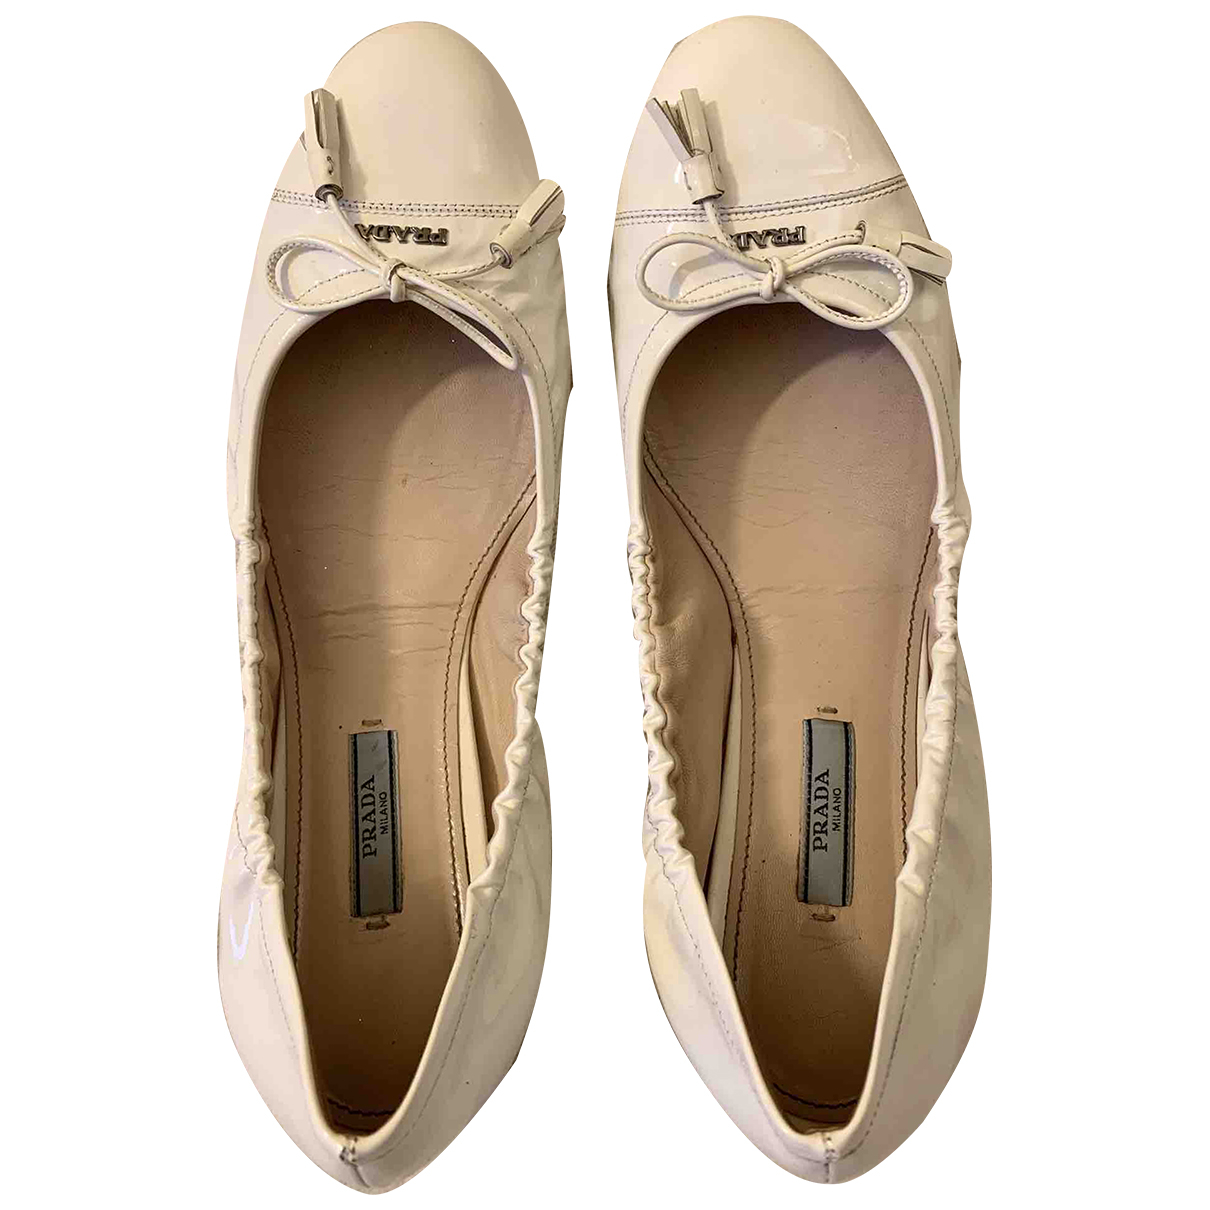 Prada N White Leather Ballet flats for Women 41 EU